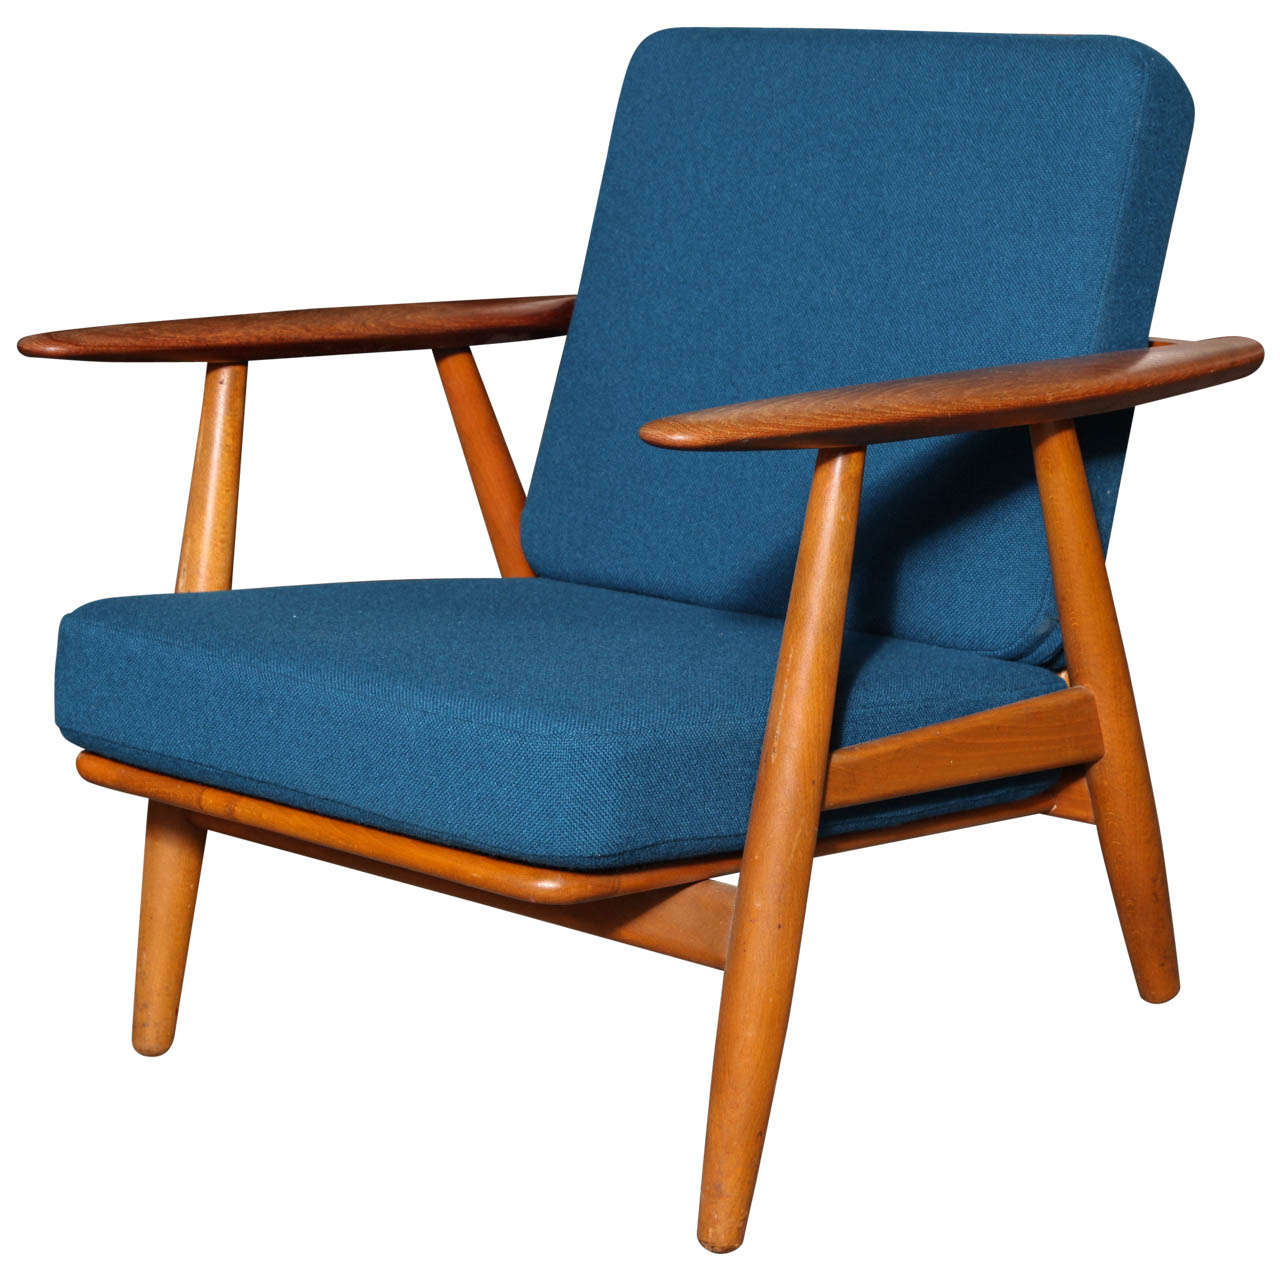 Hans Wegner GE 240 Cigar Lounge Chair at 1stdibs